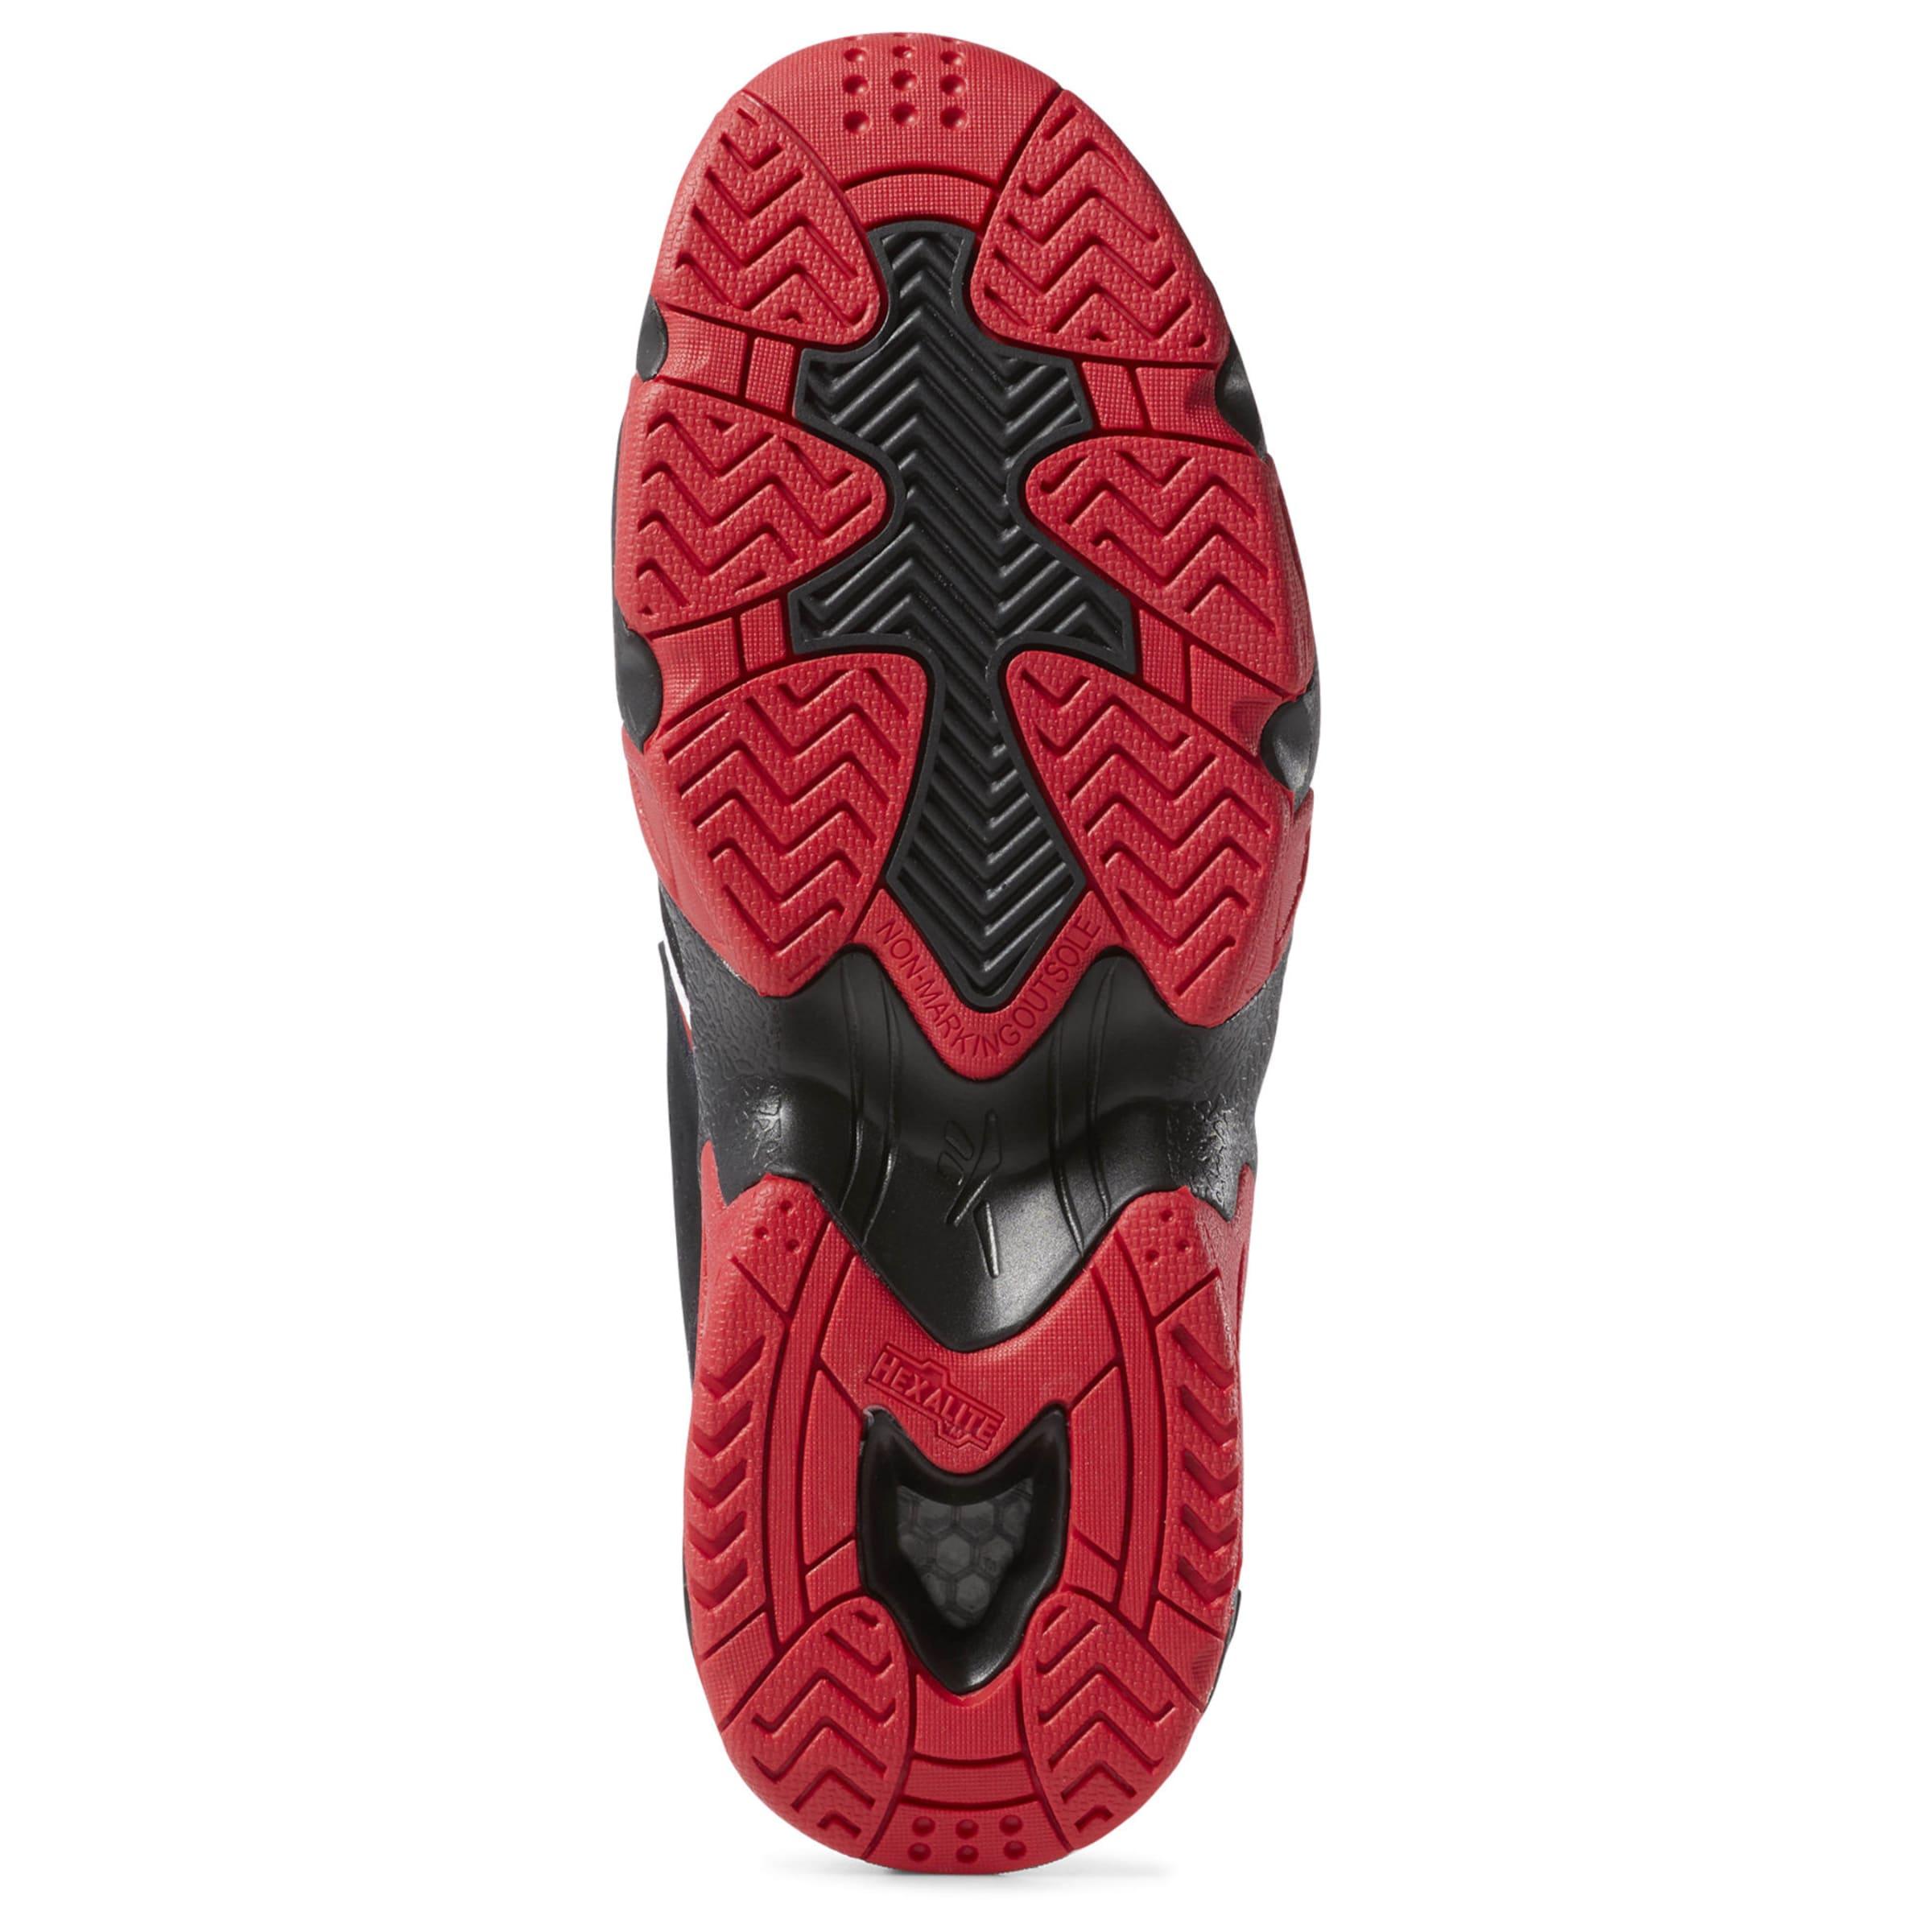 Reebok classic Schuhe 'Mobius 'Mobius 'Mobius OG Leder, sonstiges Material Markenrabatt 31b36d